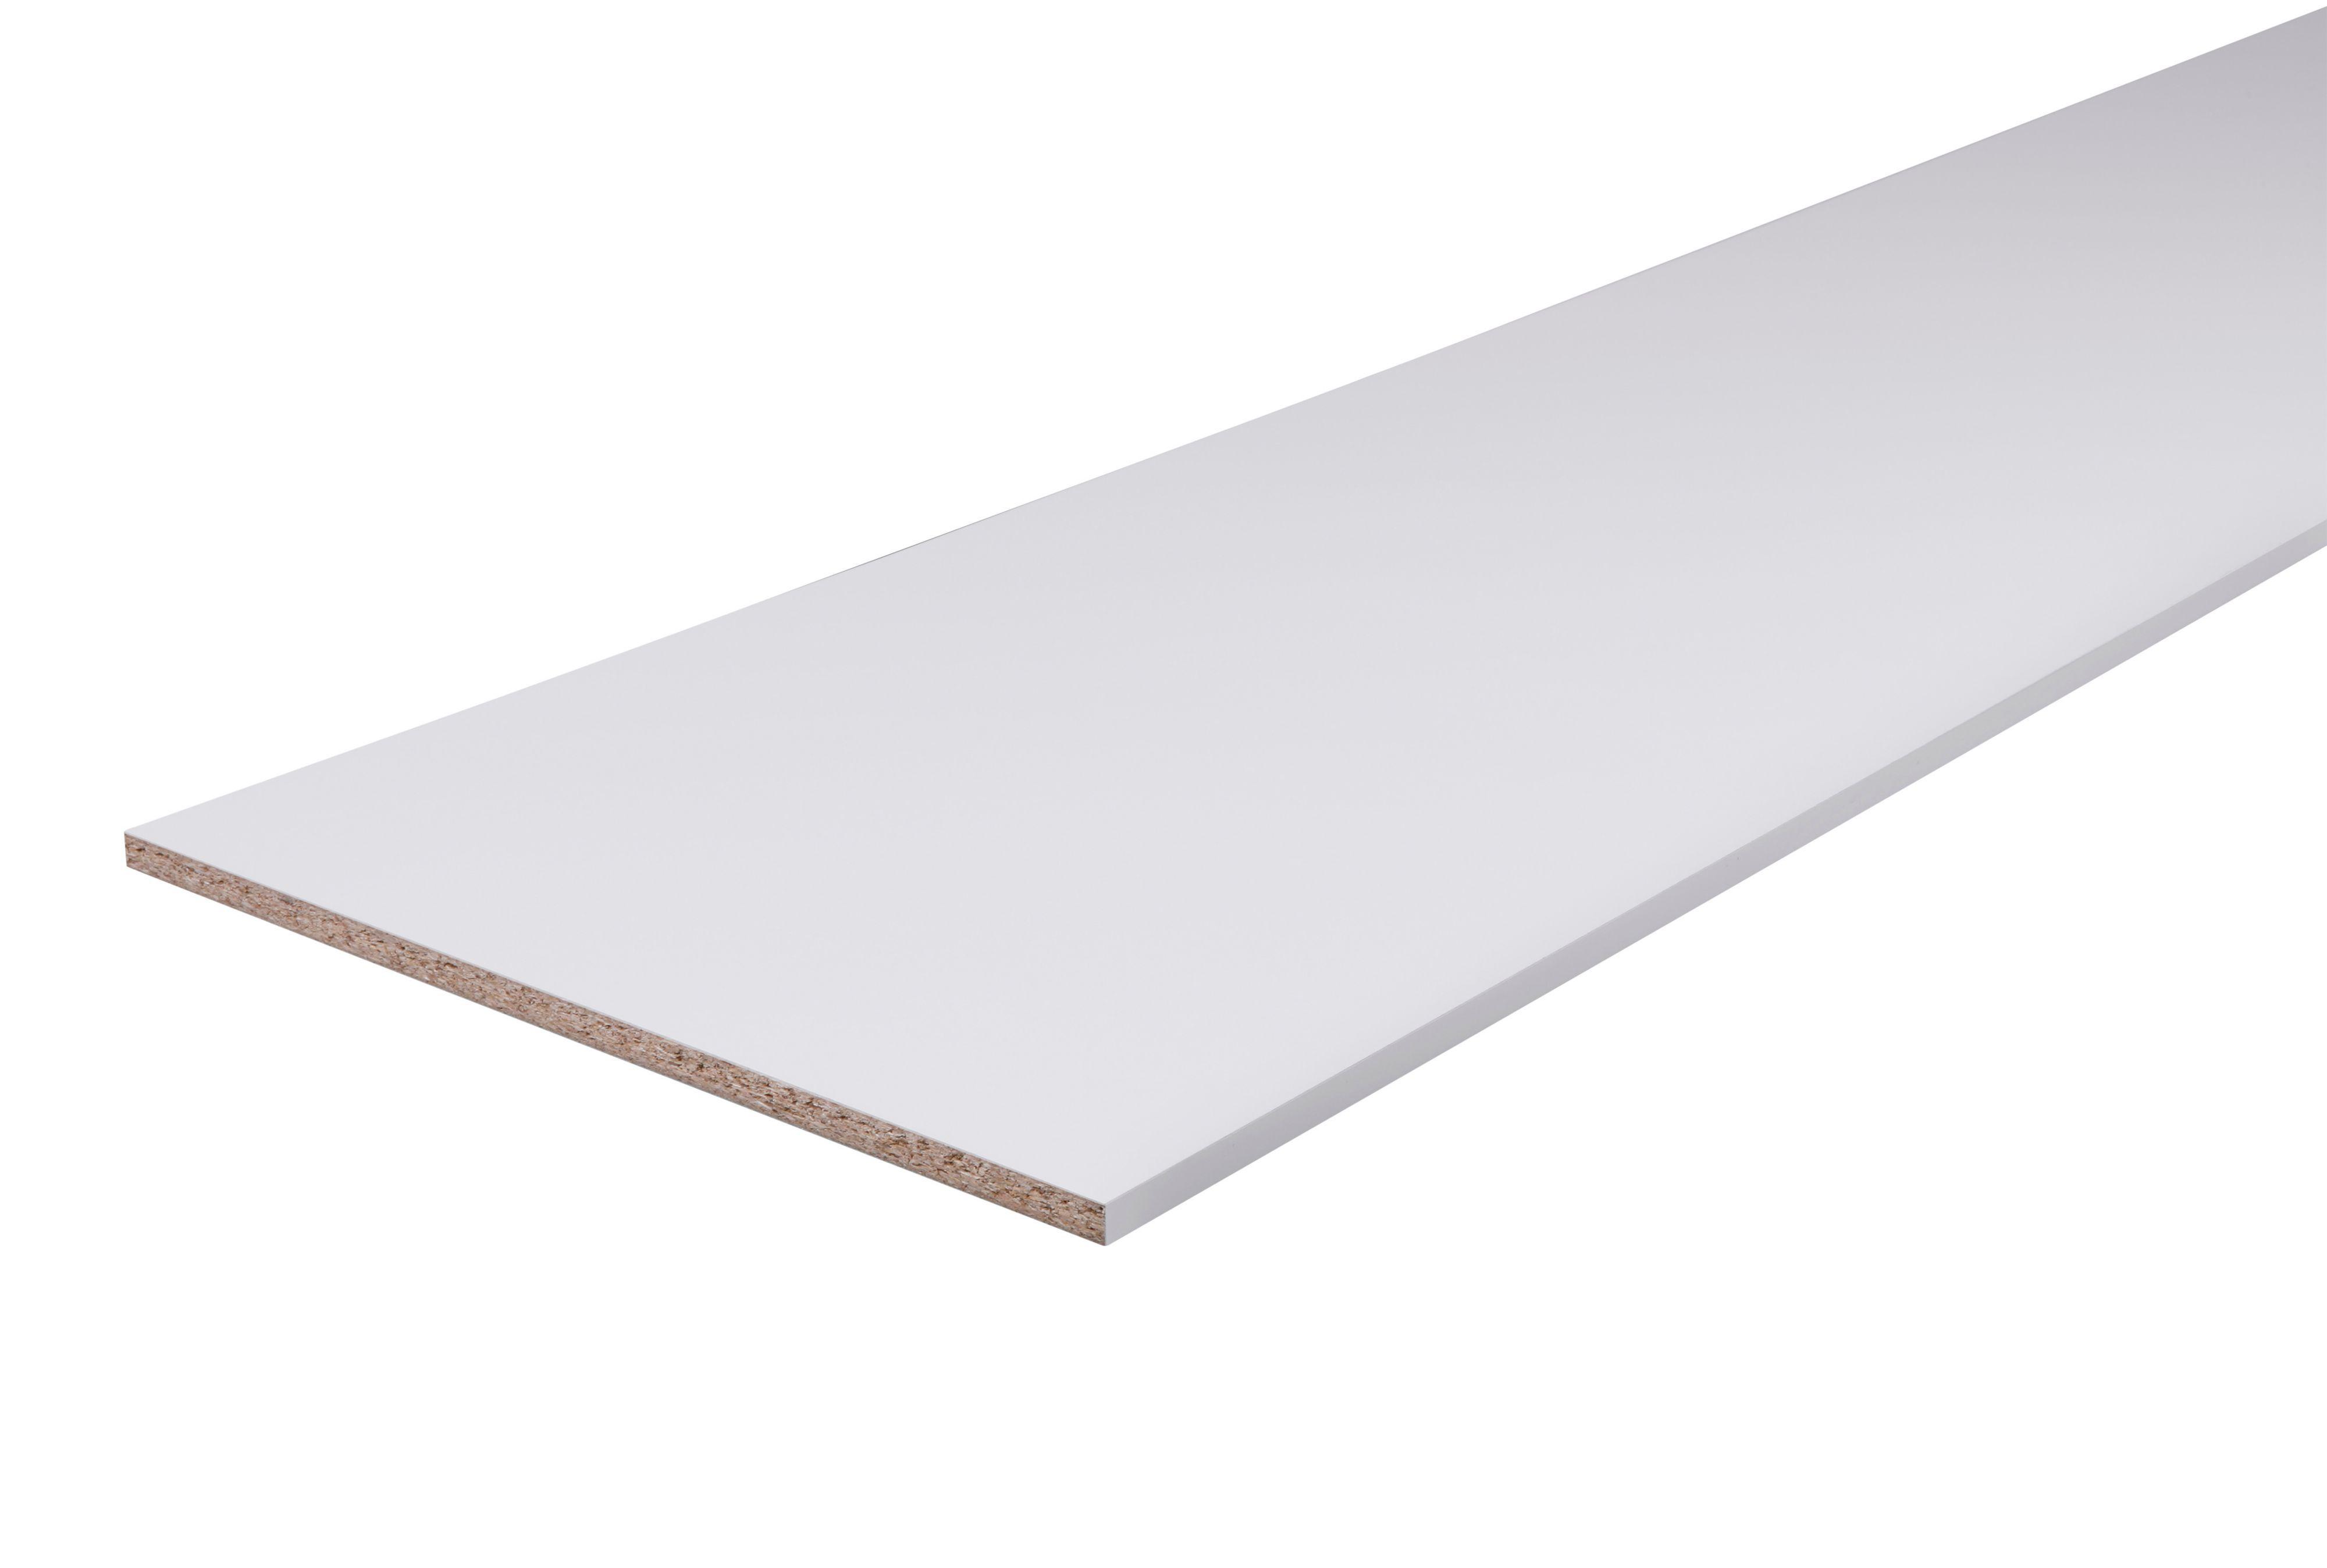 Chipboard White Furniture Board L 2500mm W 300mm T 18mm